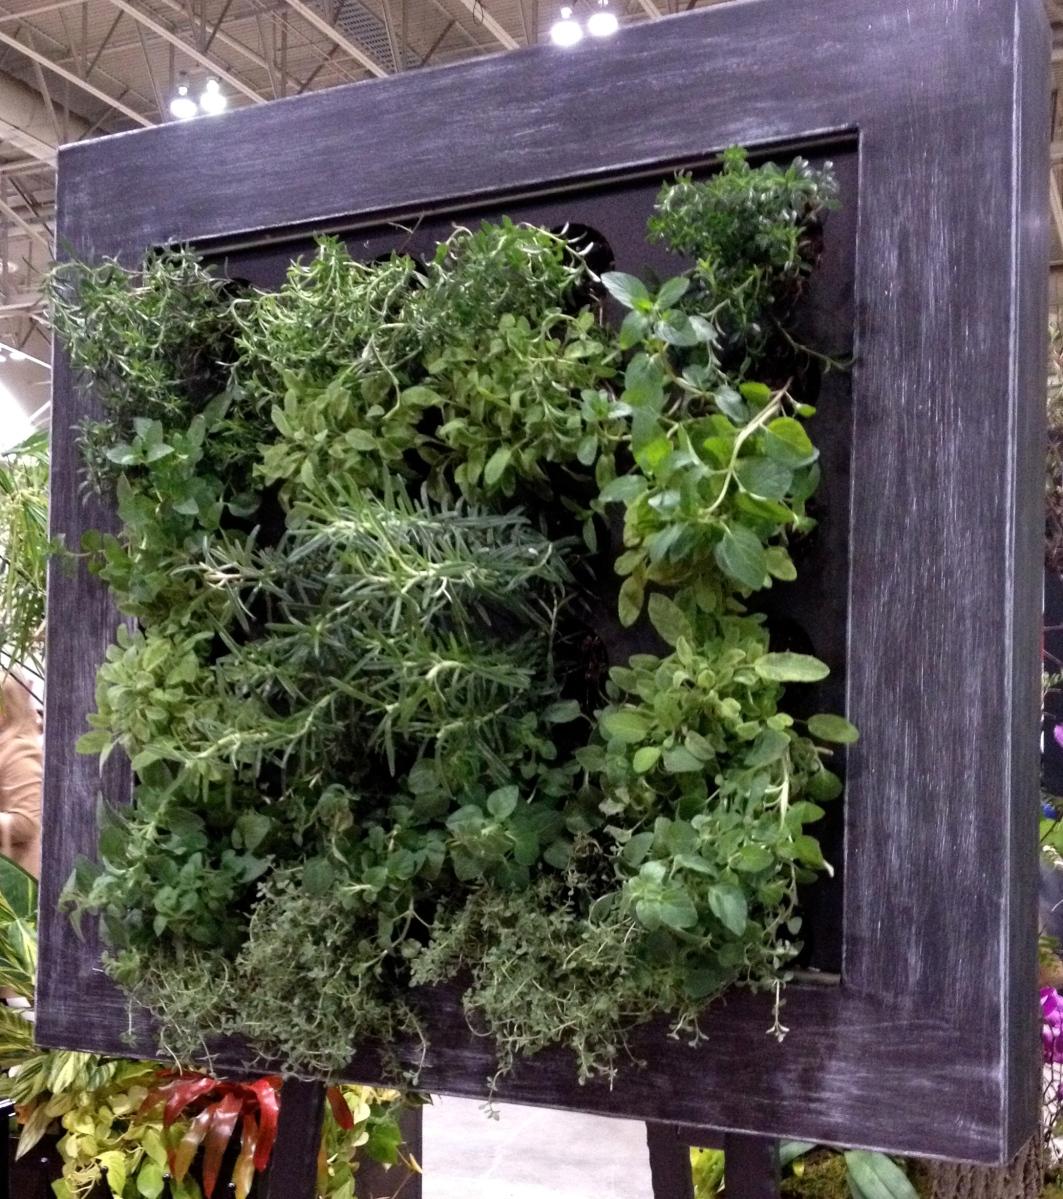 Herbs grown vertically in frame.